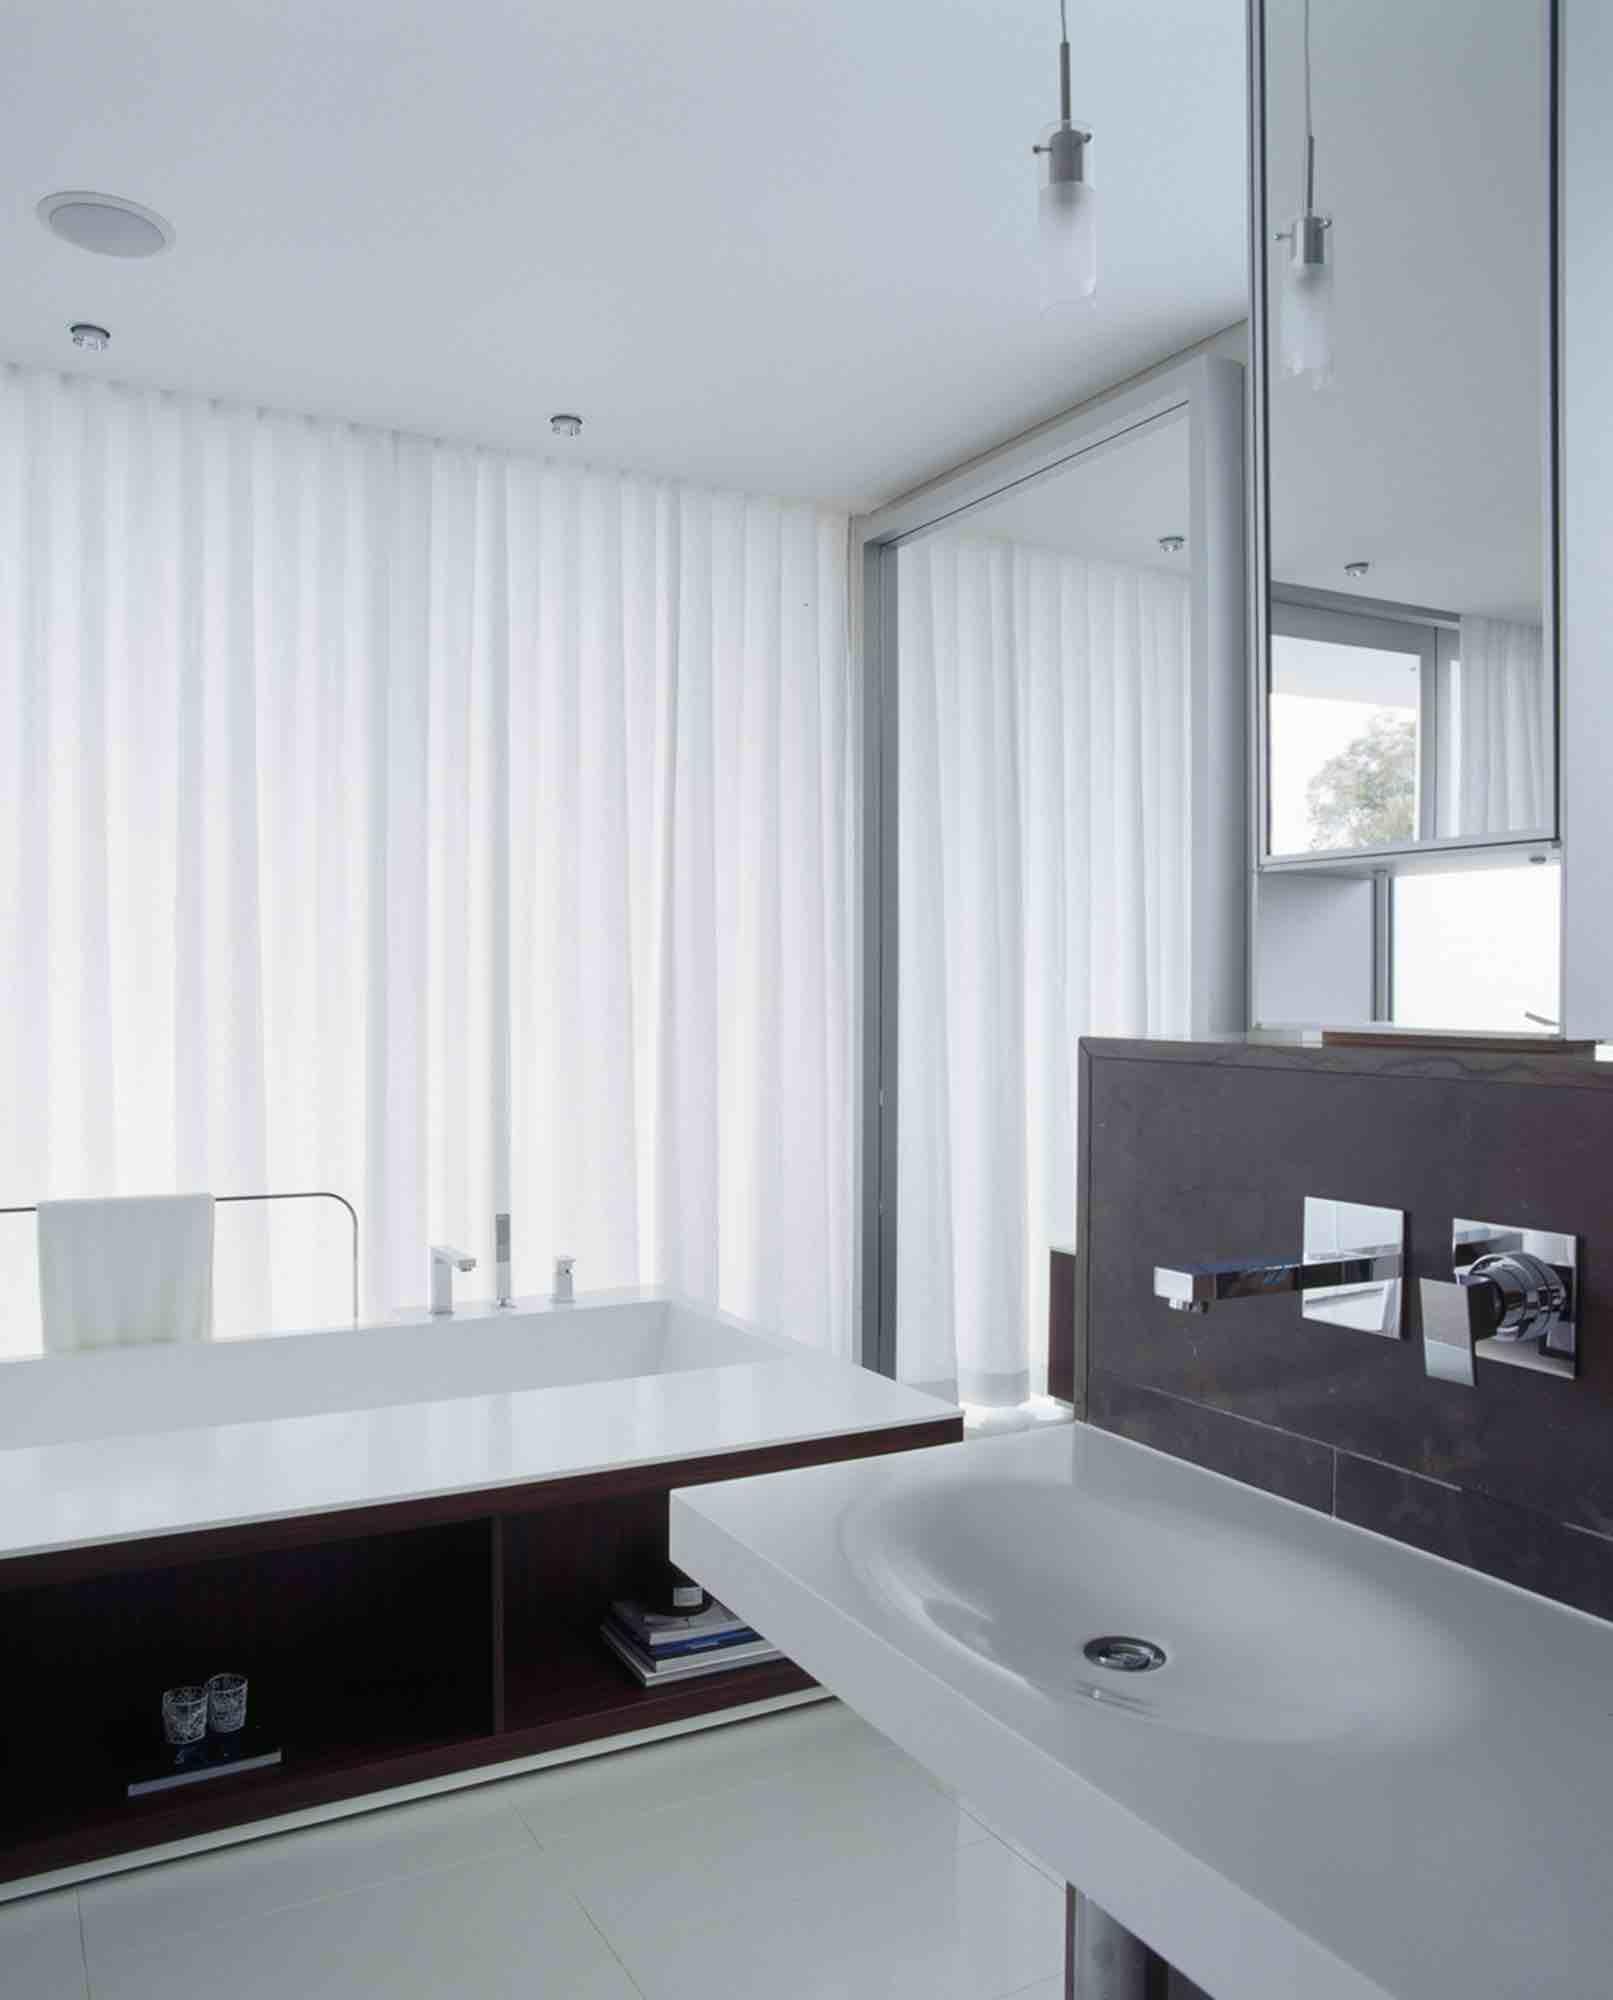 minosa-design-open-plan-ensuite-parents-retreat-dover-heights-portland-st-scooped-double-rifra-freestanding-corian-bath-shear-curtain-bathroom-05